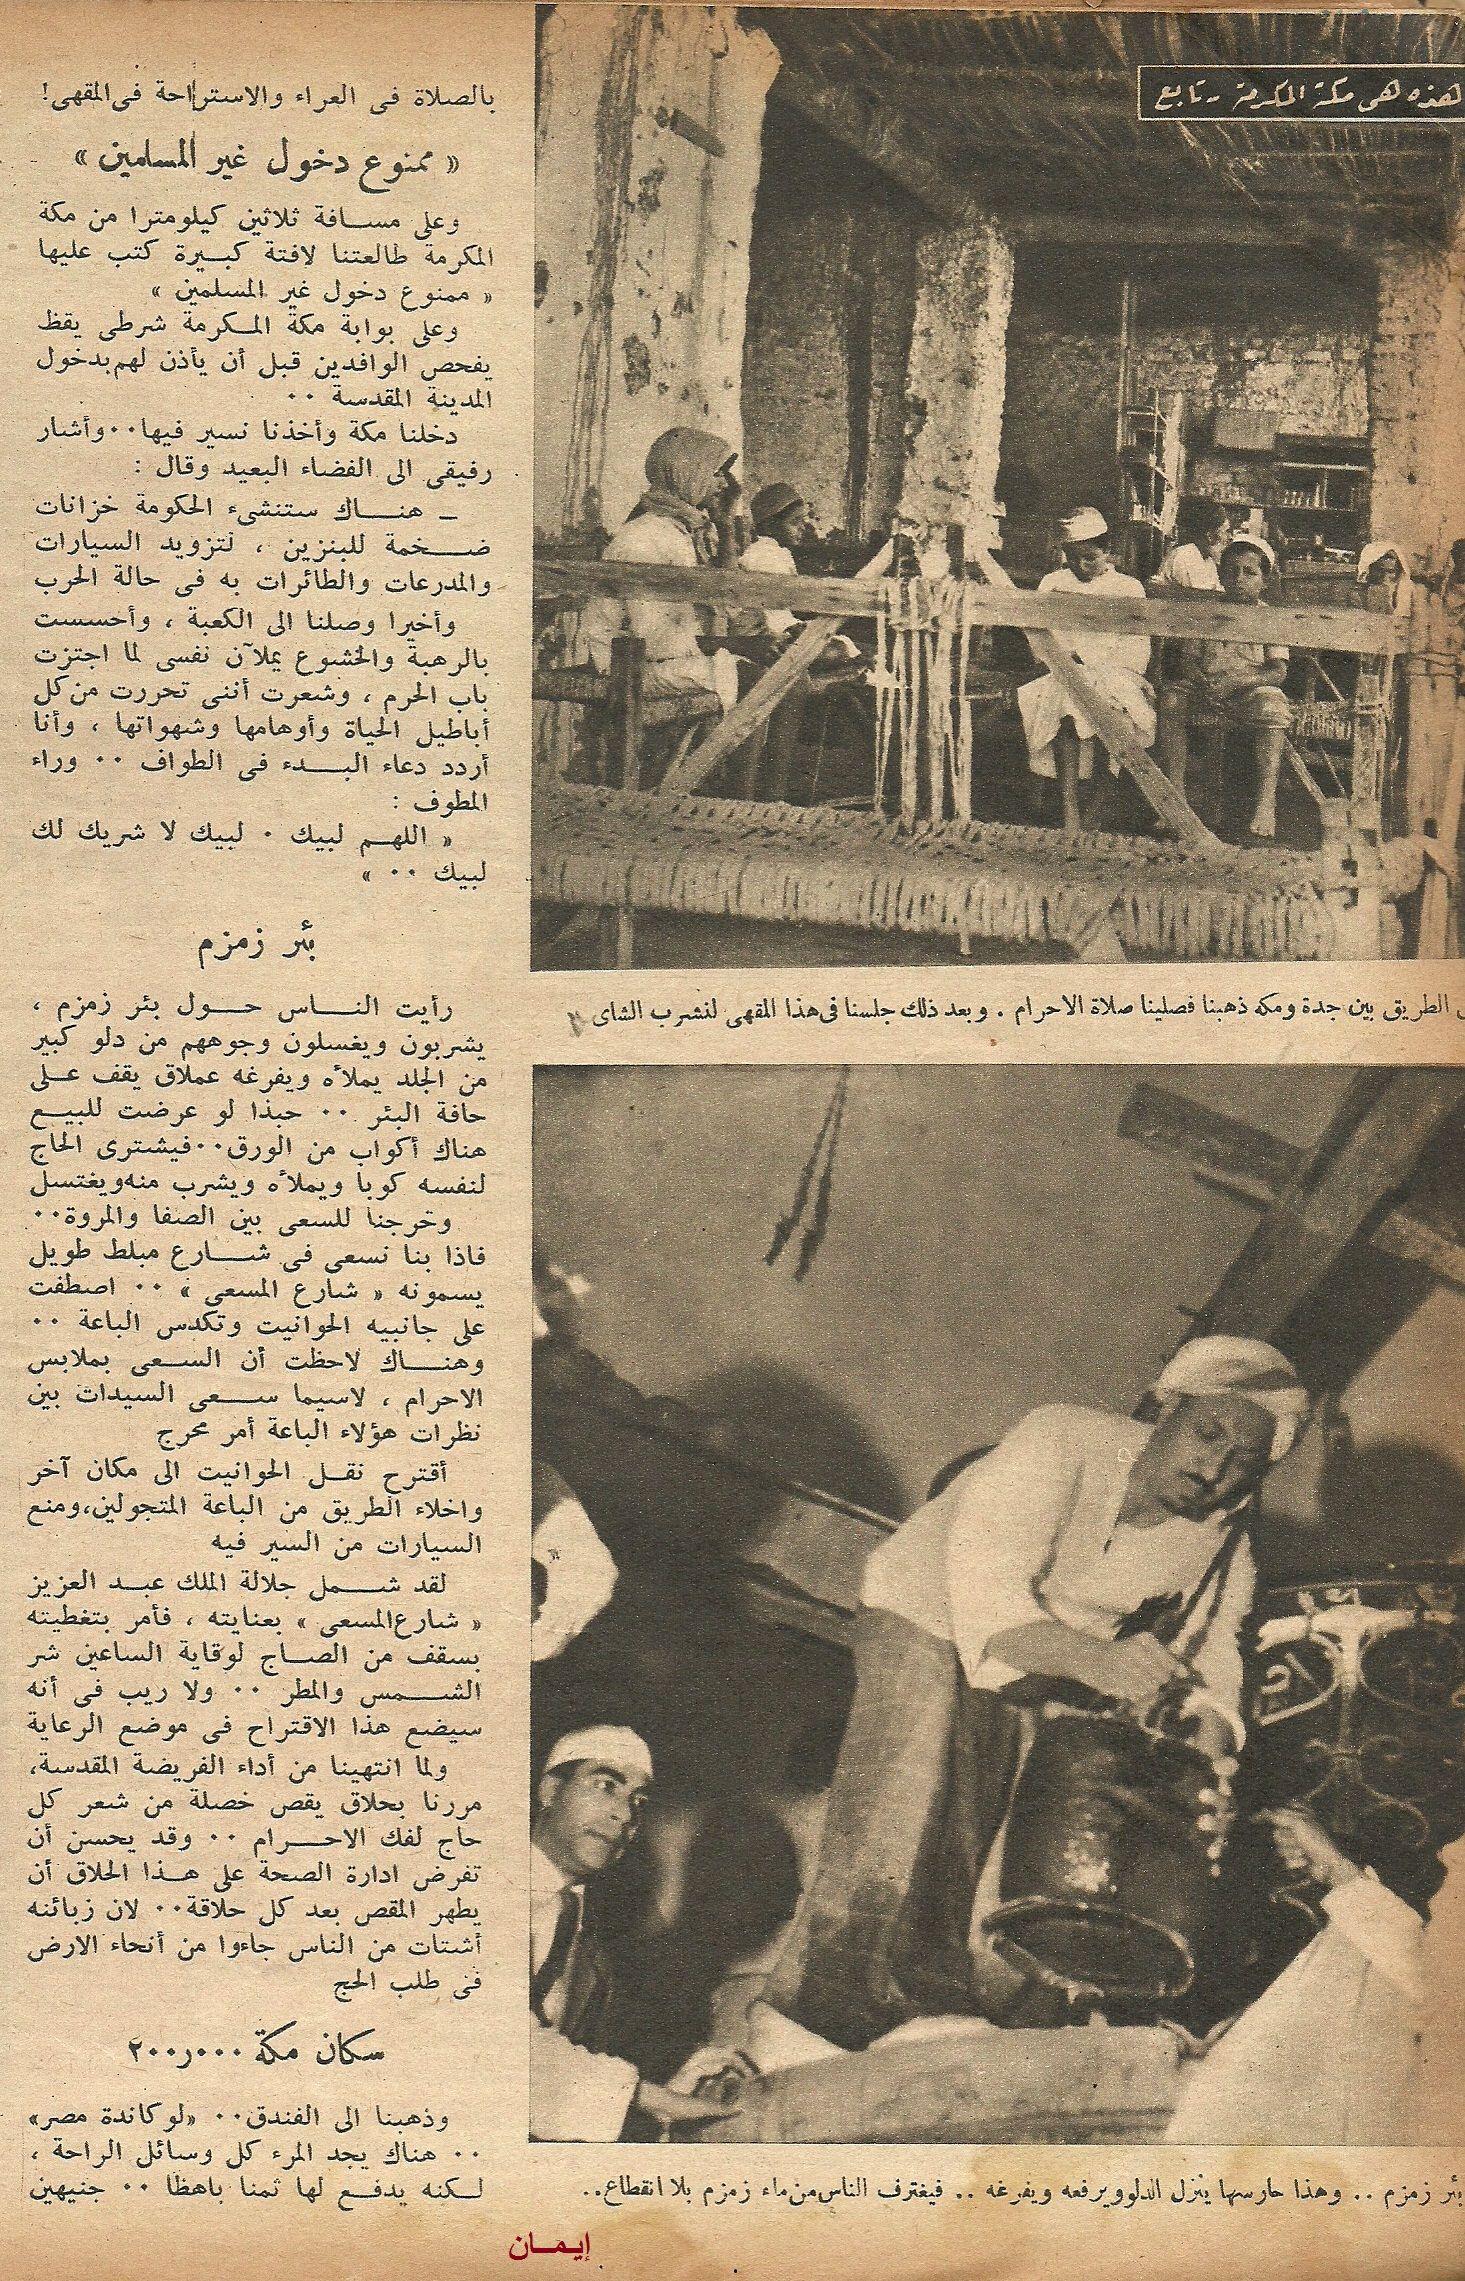 بئر زمزم زمان المصور العدد 1346 13 شوال 1369 هـ 28 يوليو 1950 م Mecca Madinah Masjid Al Haram Mecca